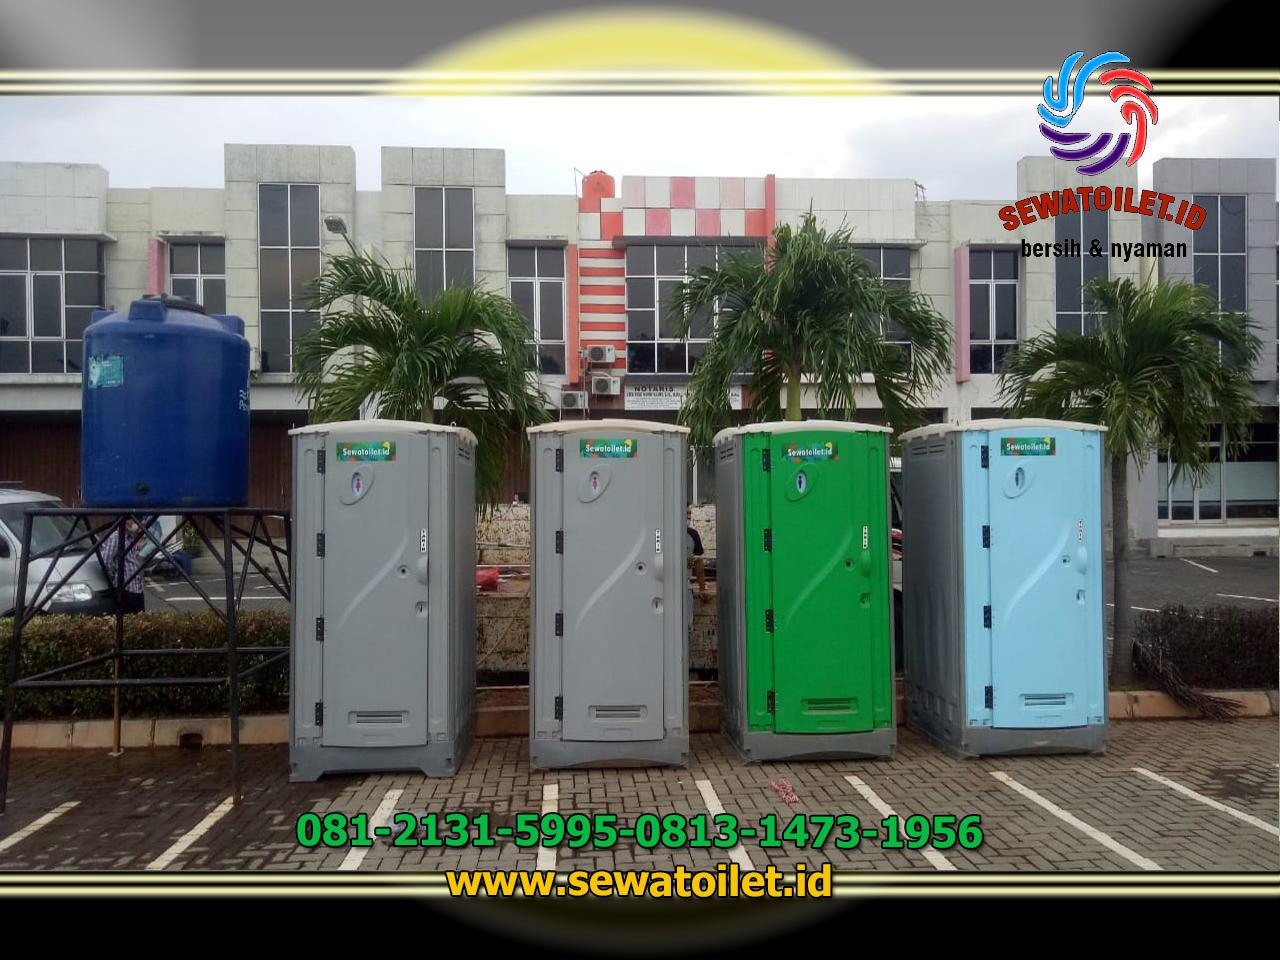 Sewa Toilet Portable Acara Vaksin Johar Baru Jakarta Pusat